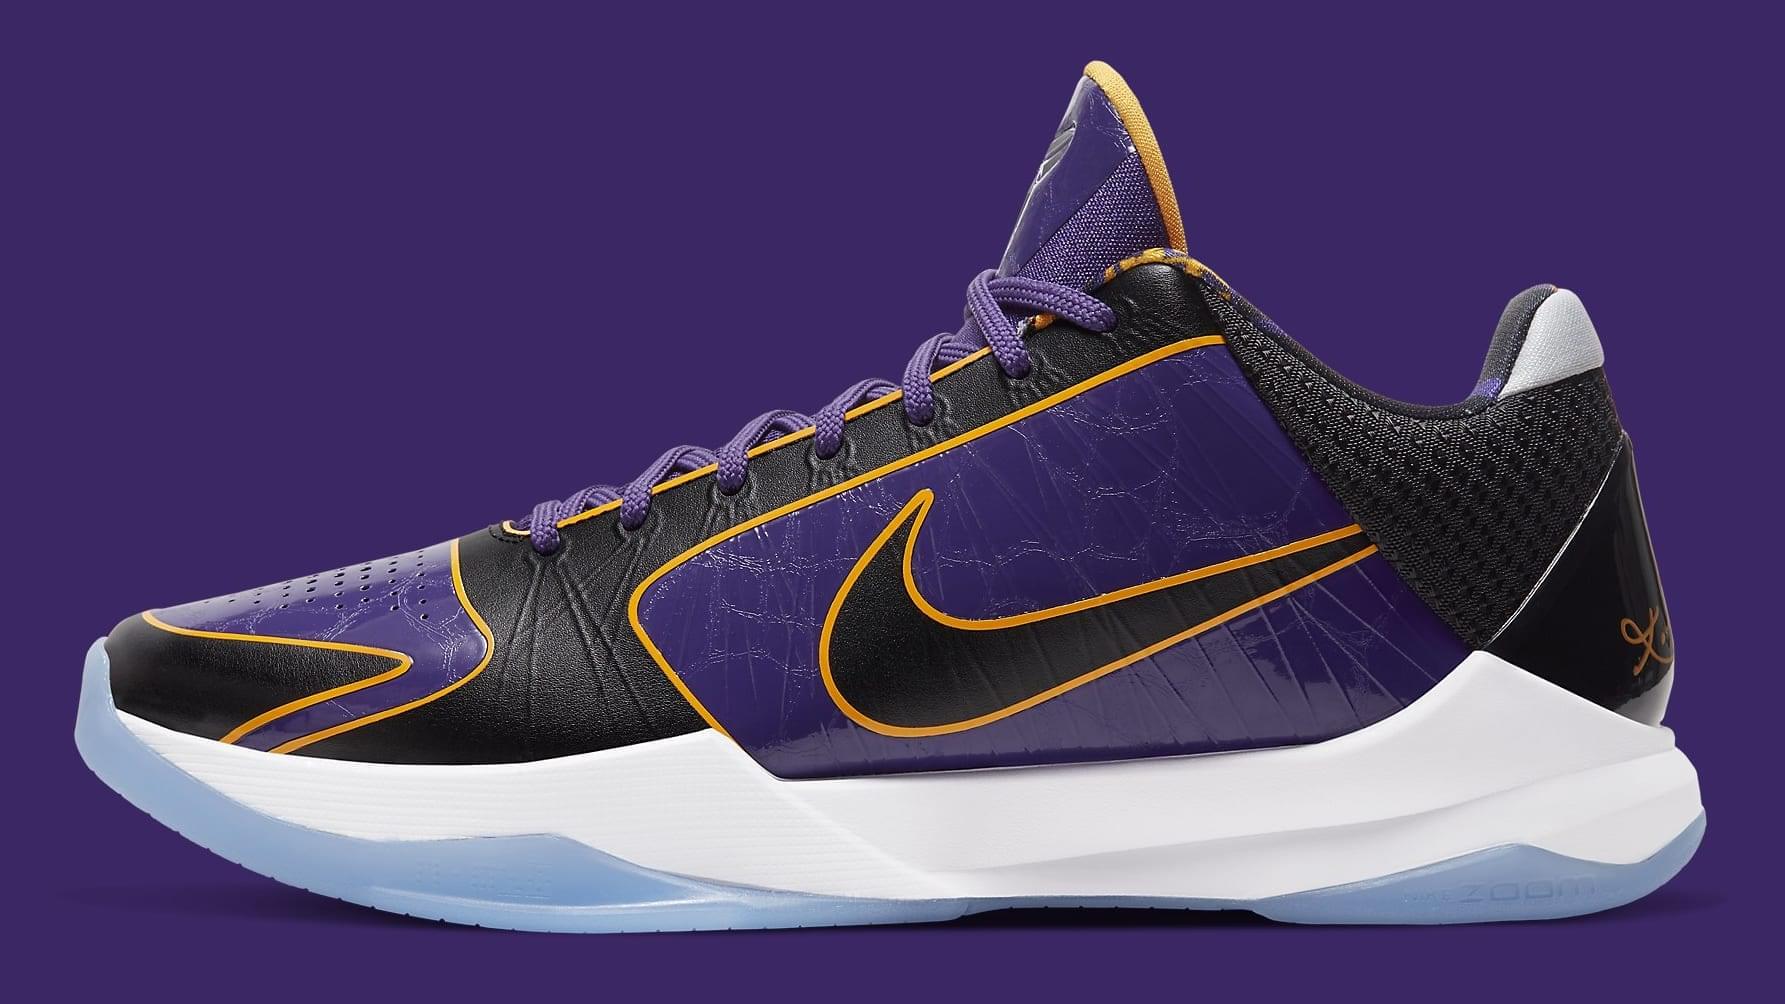 Lakers' Nike Kobe 5 Protro Drops Next